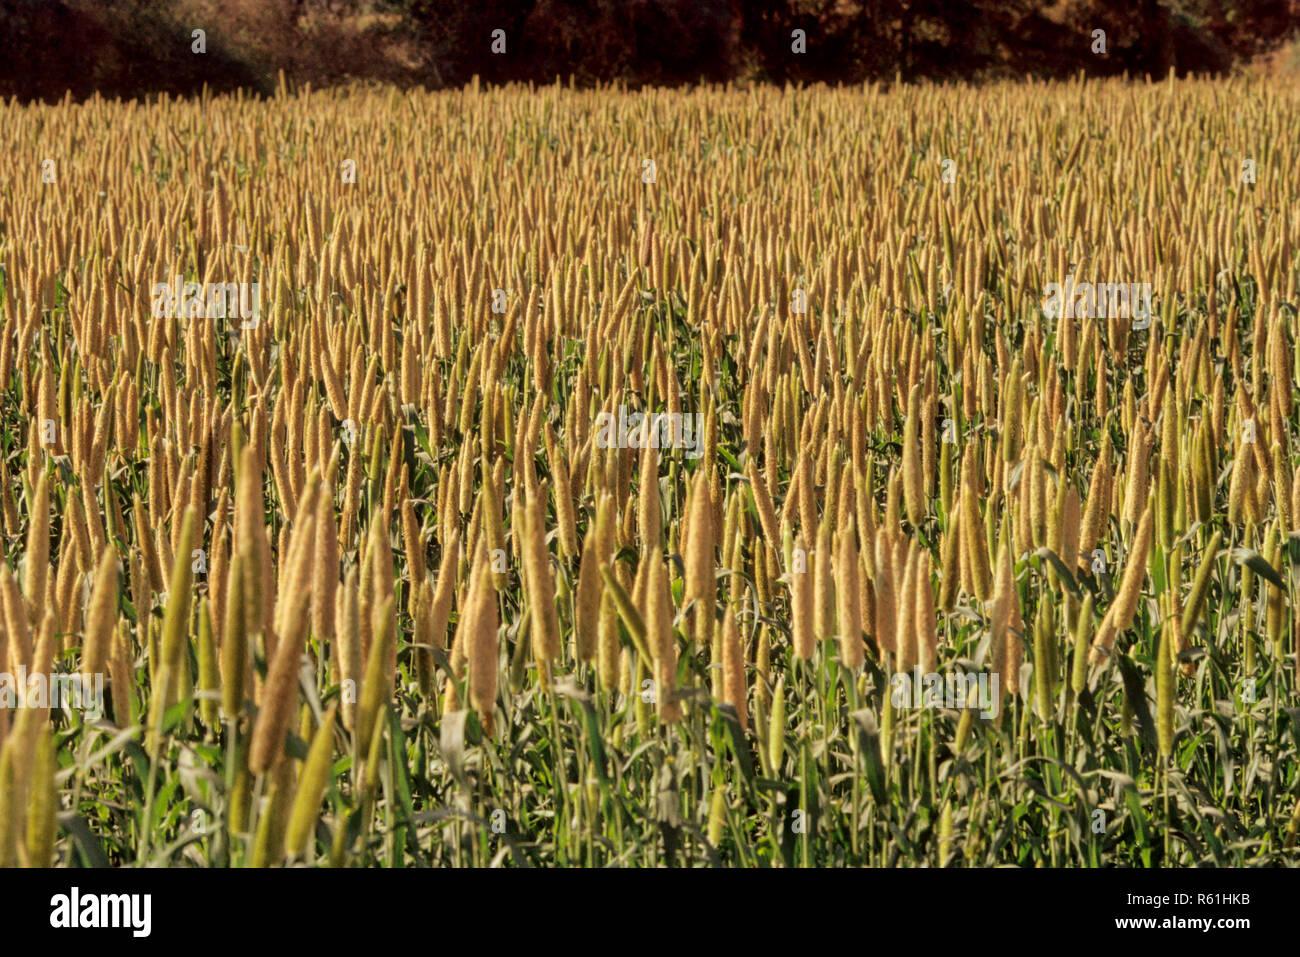 bajra crop, india - Stock Image